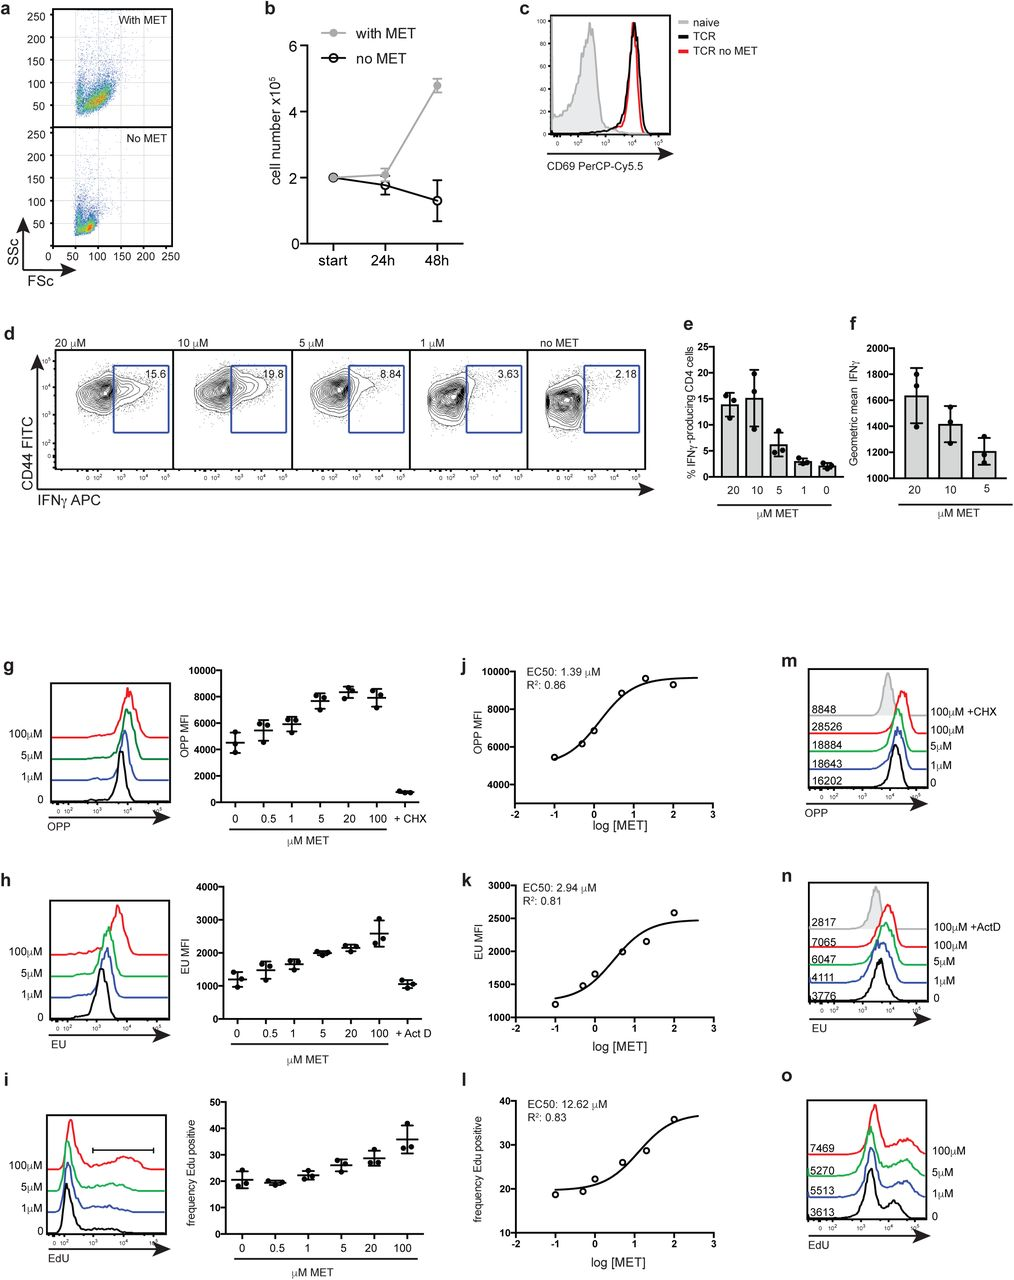 Antigen receptor control of methionine metabolism in T cells | bioRxiv